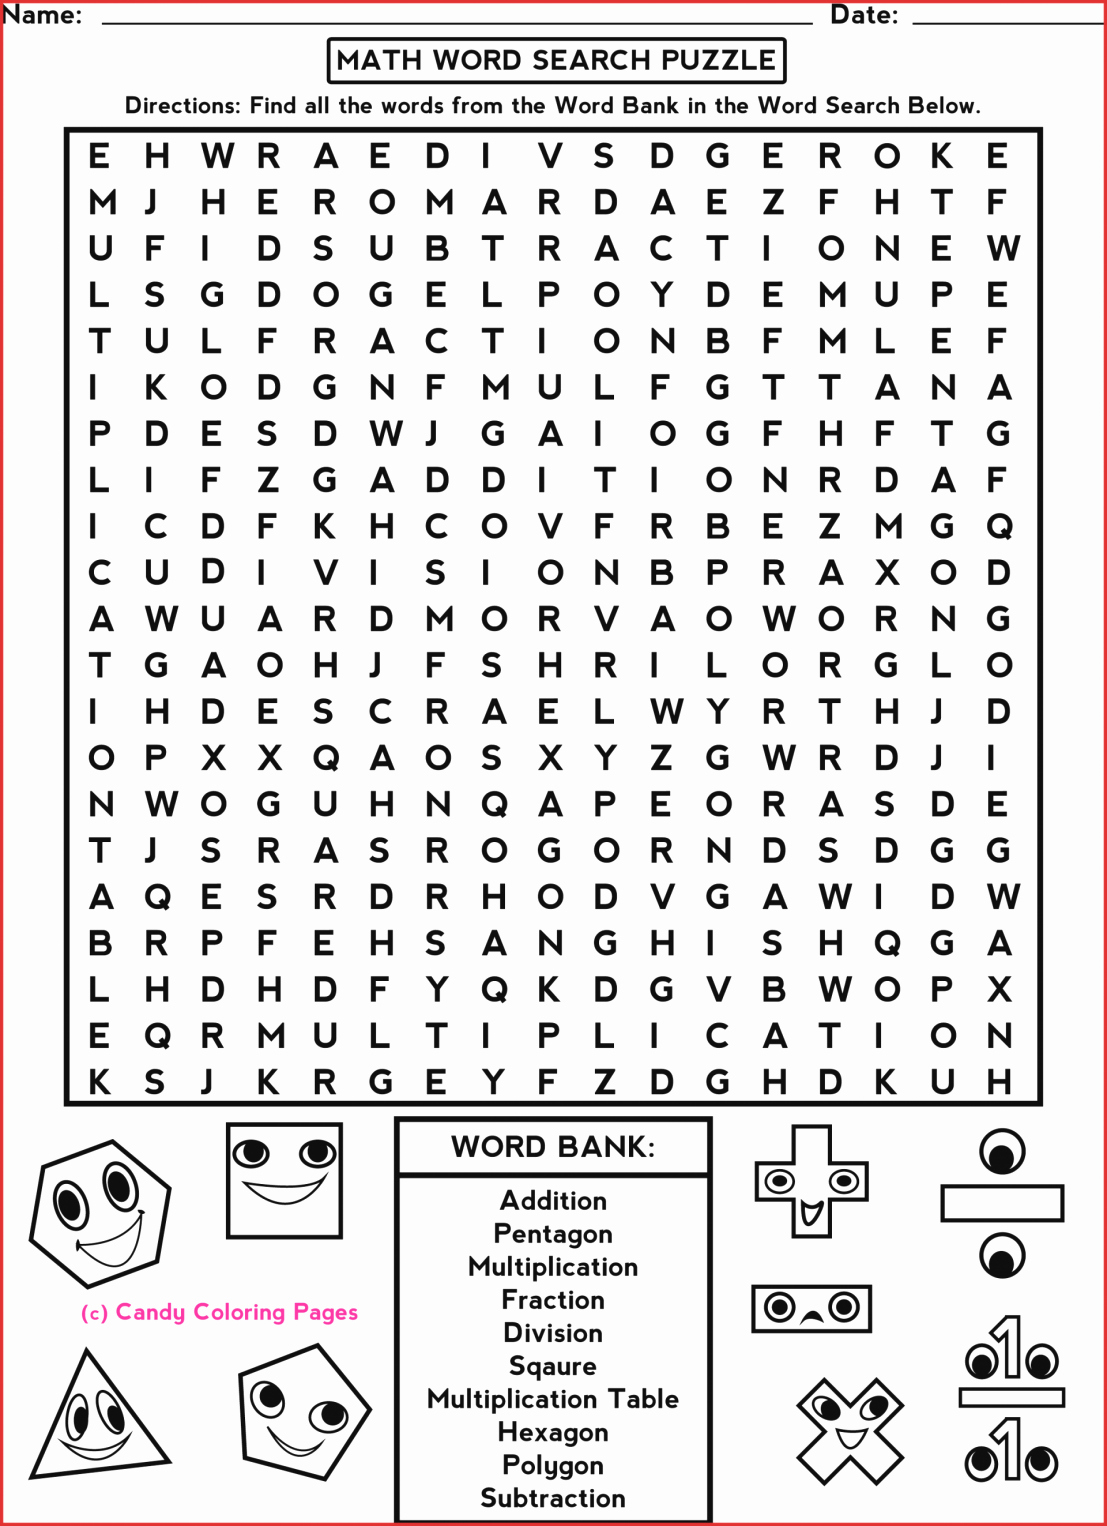 7Th Grade Crossword Puzzles Fresh 7Th Grade Math Word Search - Printable Crossword Puzzles For 3Rd Graders